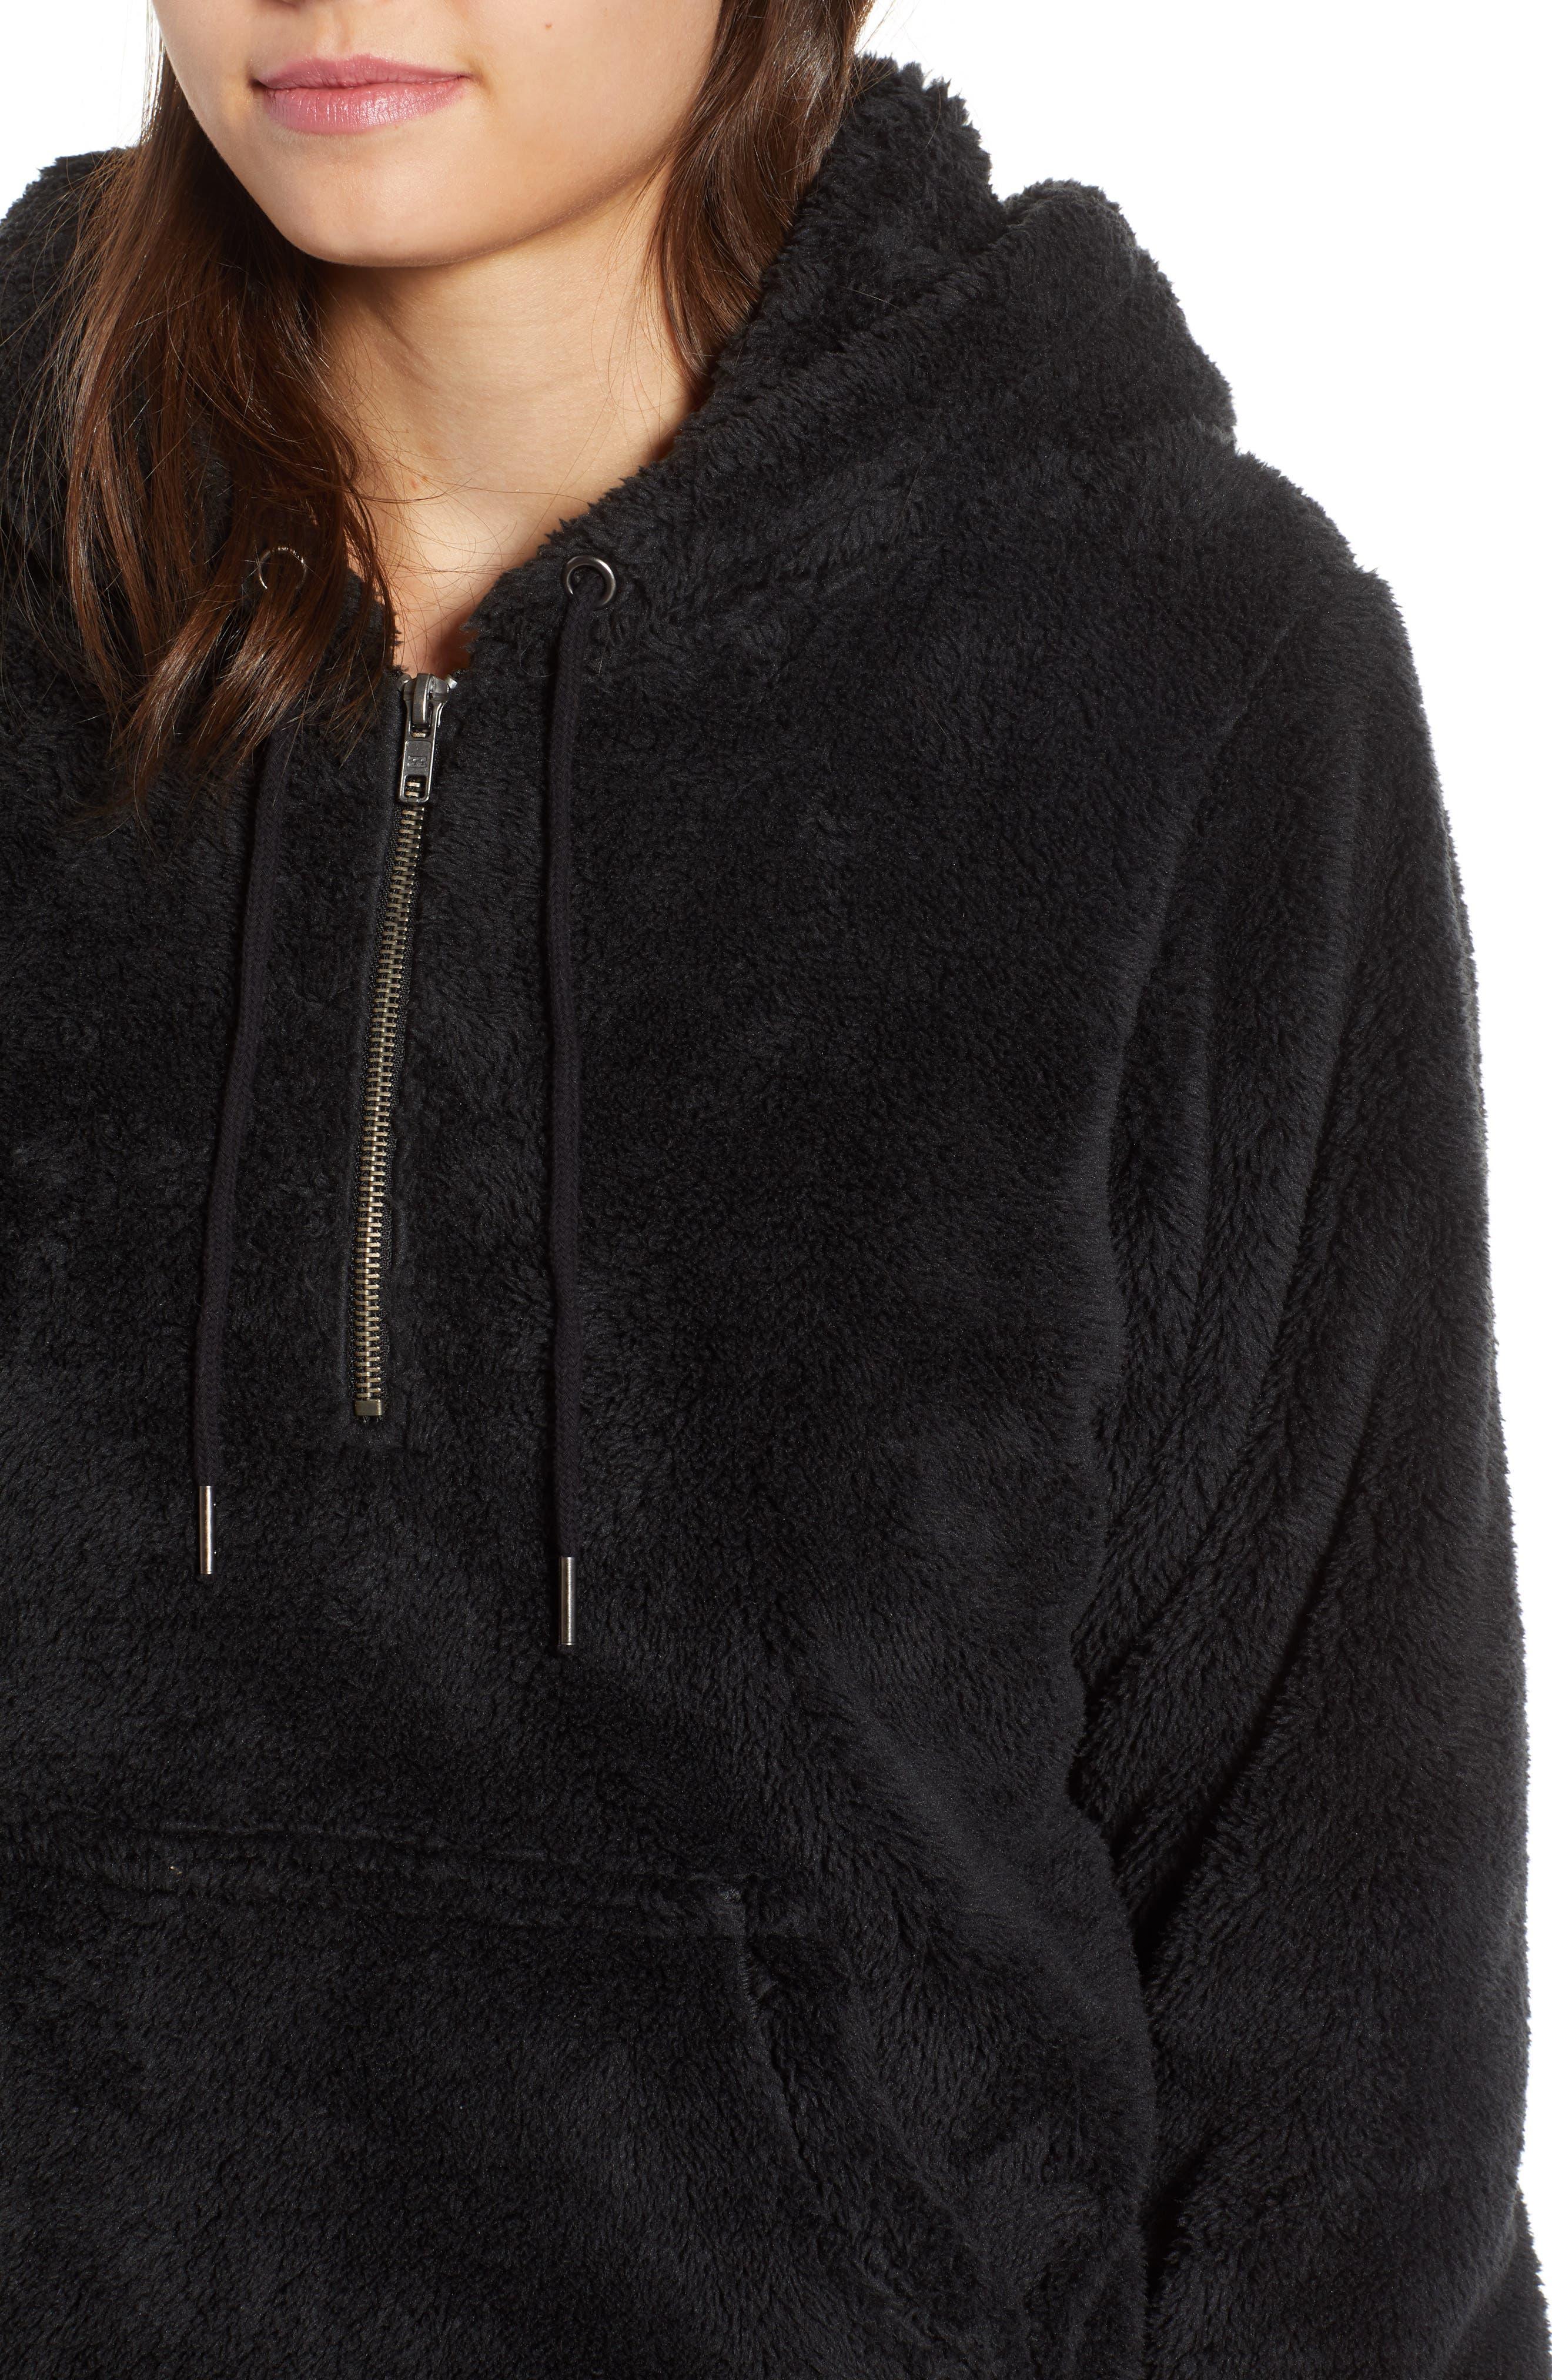 BILLABONG, Cozy For Keeps Fleece Pullover, Alternate thumbnail 5, color, 001